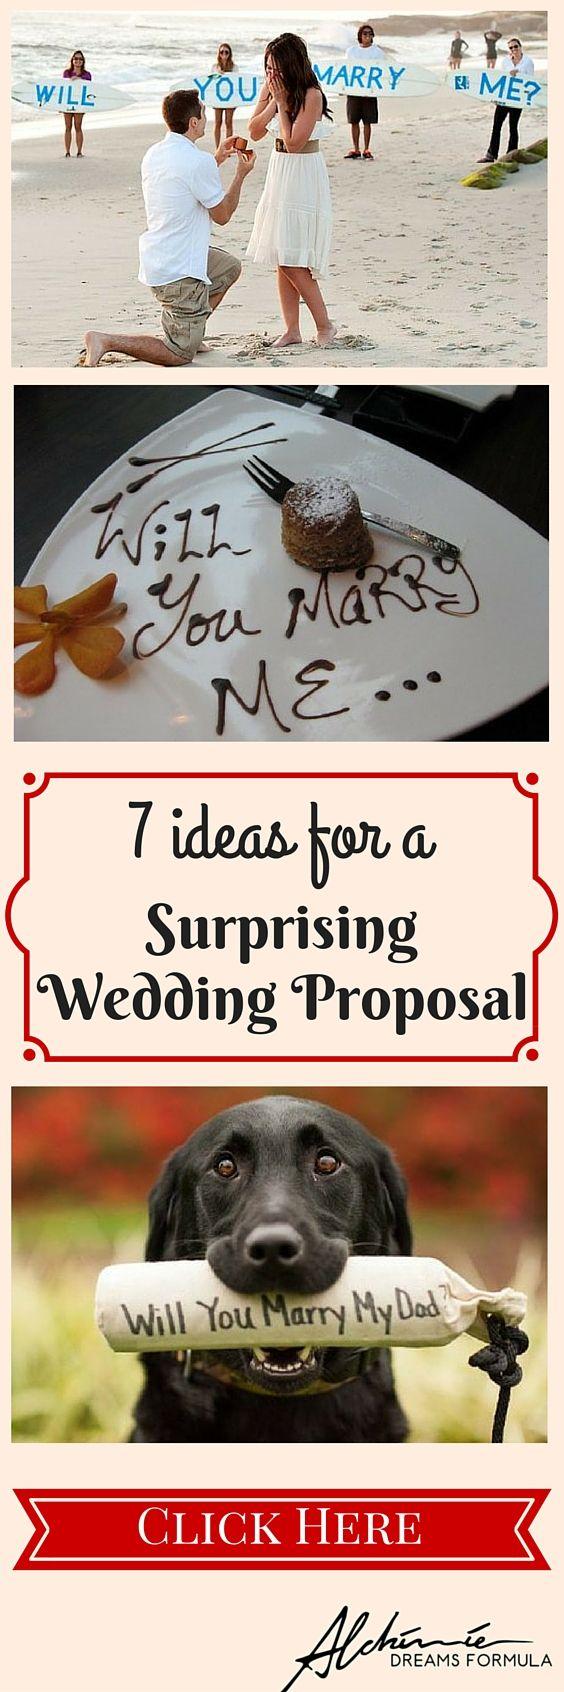 Wedding Proposal: When Everything Begins